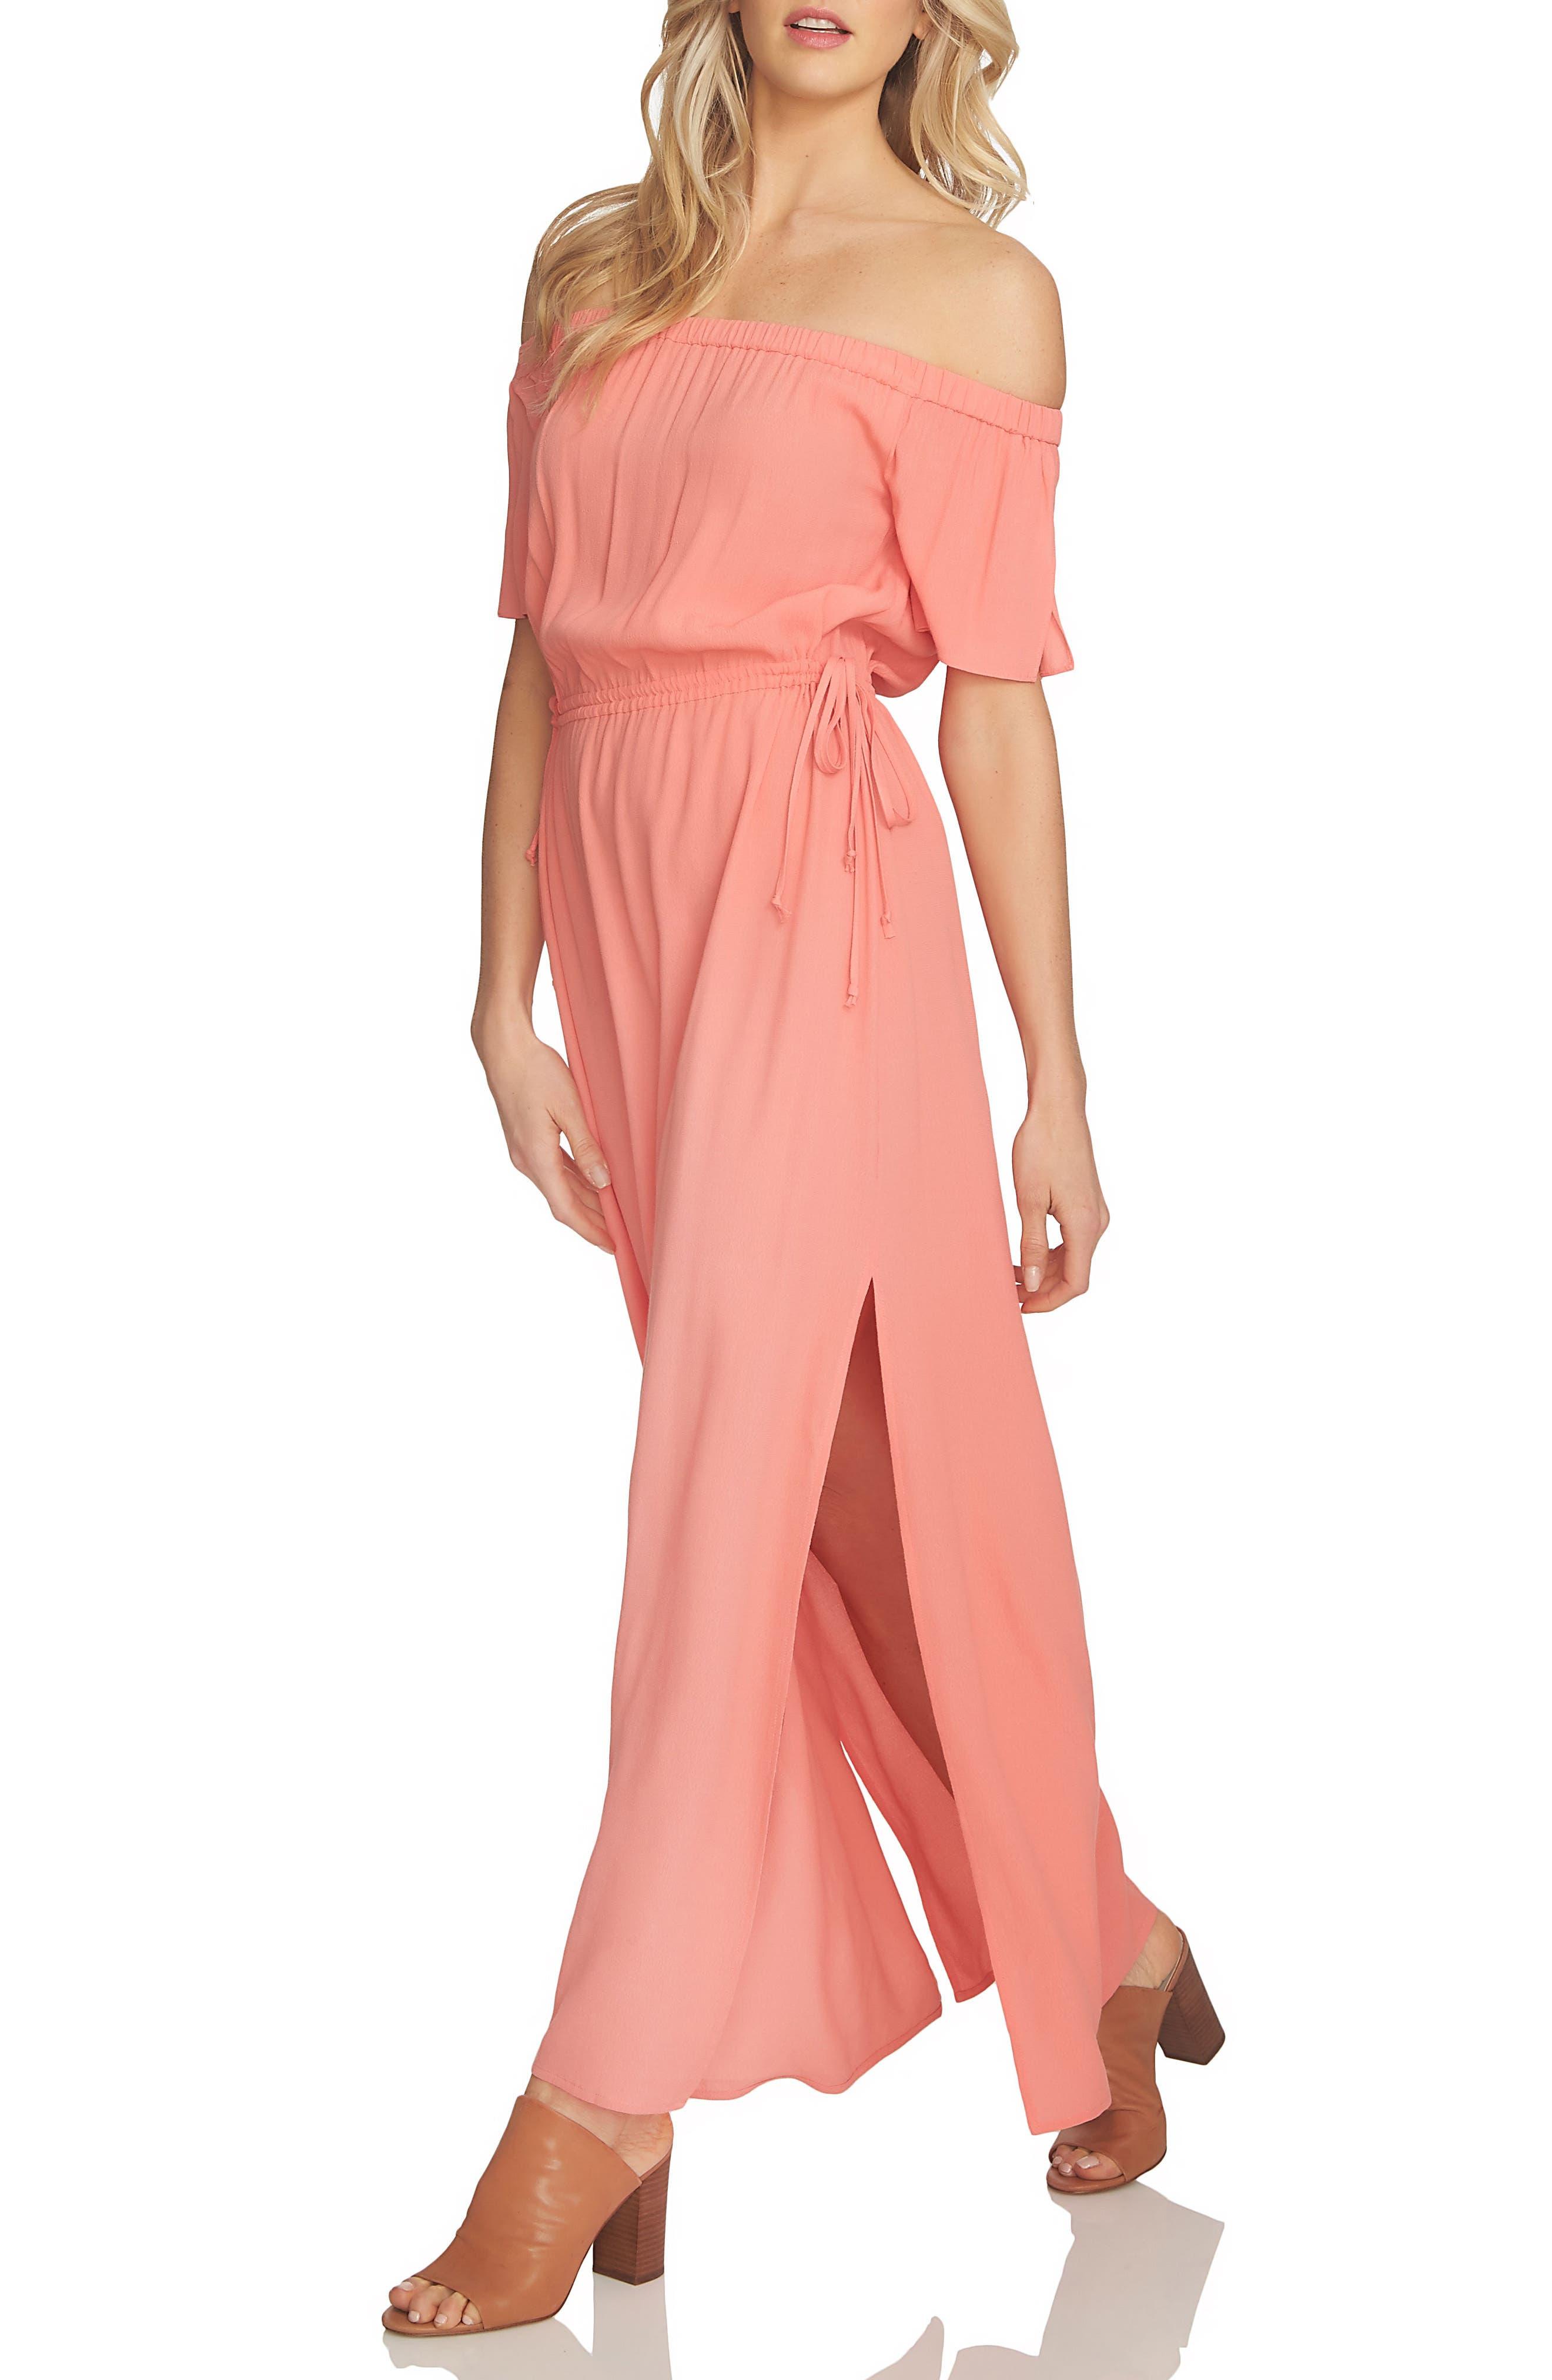 Alternate Image 1 Selected - 1.STATE Blouson Off the Shoulder Maxi Dress